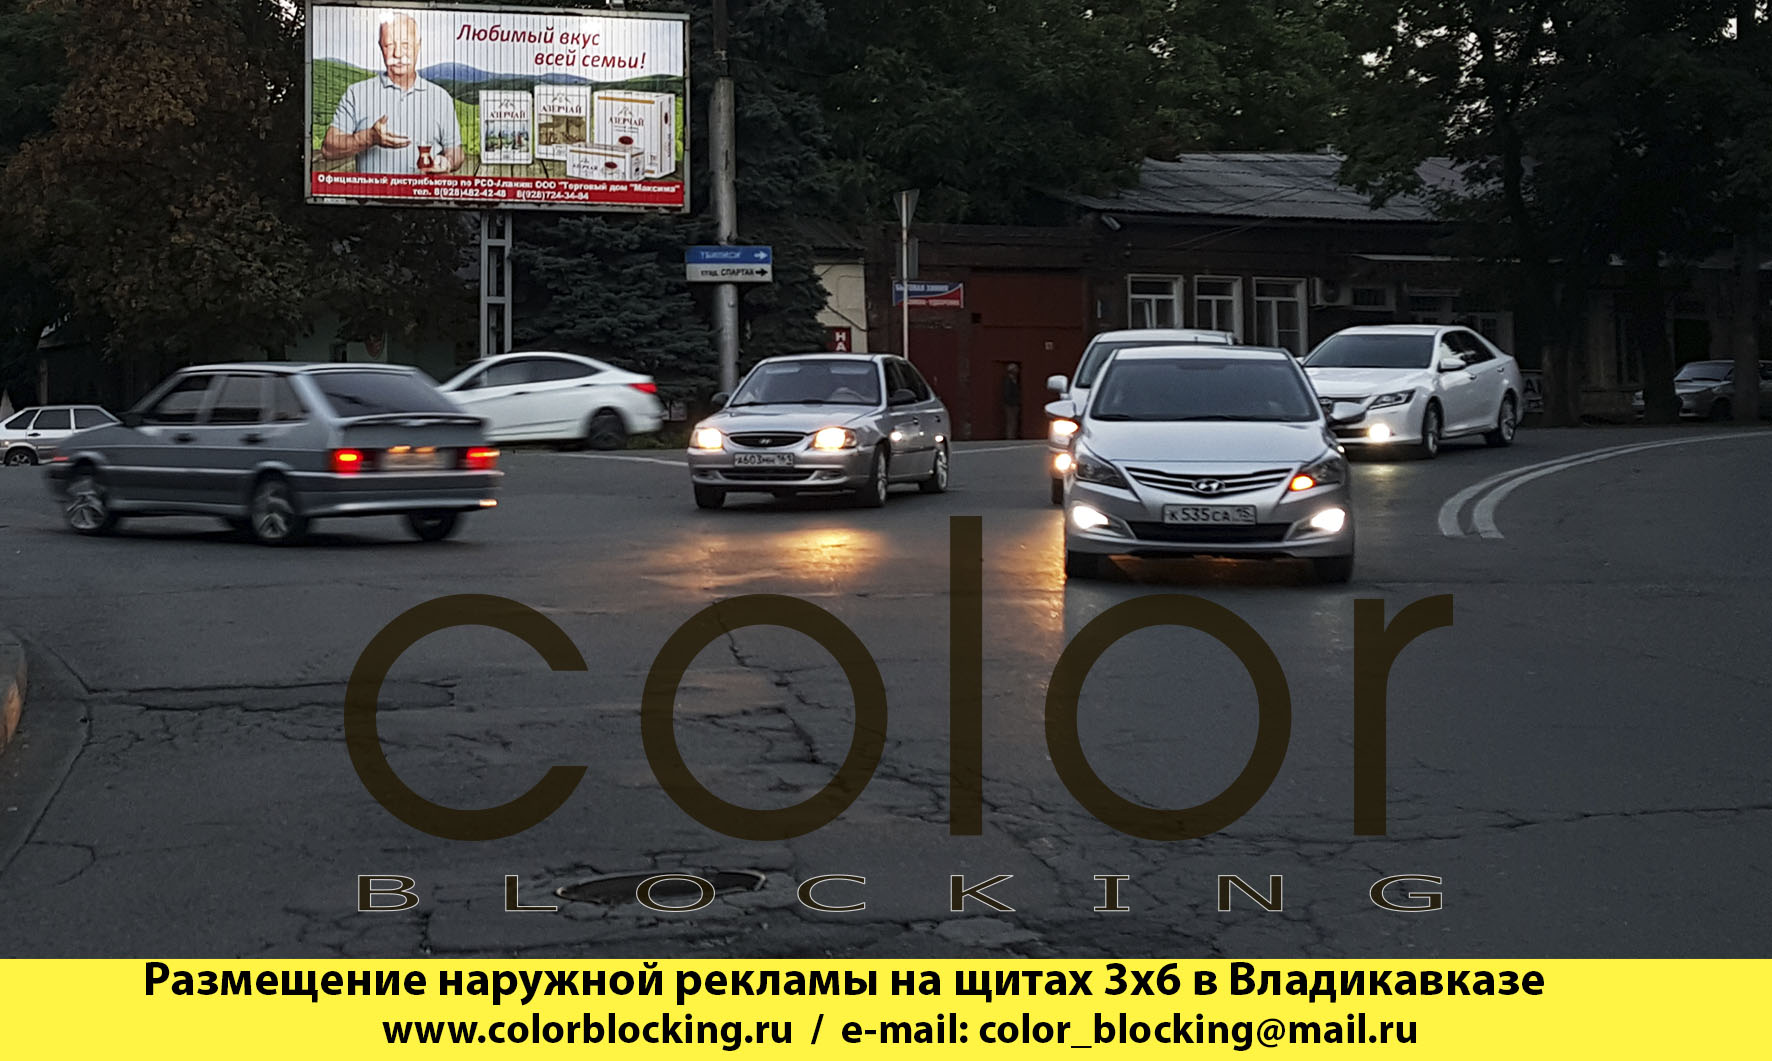 Реклама на щитах 3х6 в Владикавказе арендовать